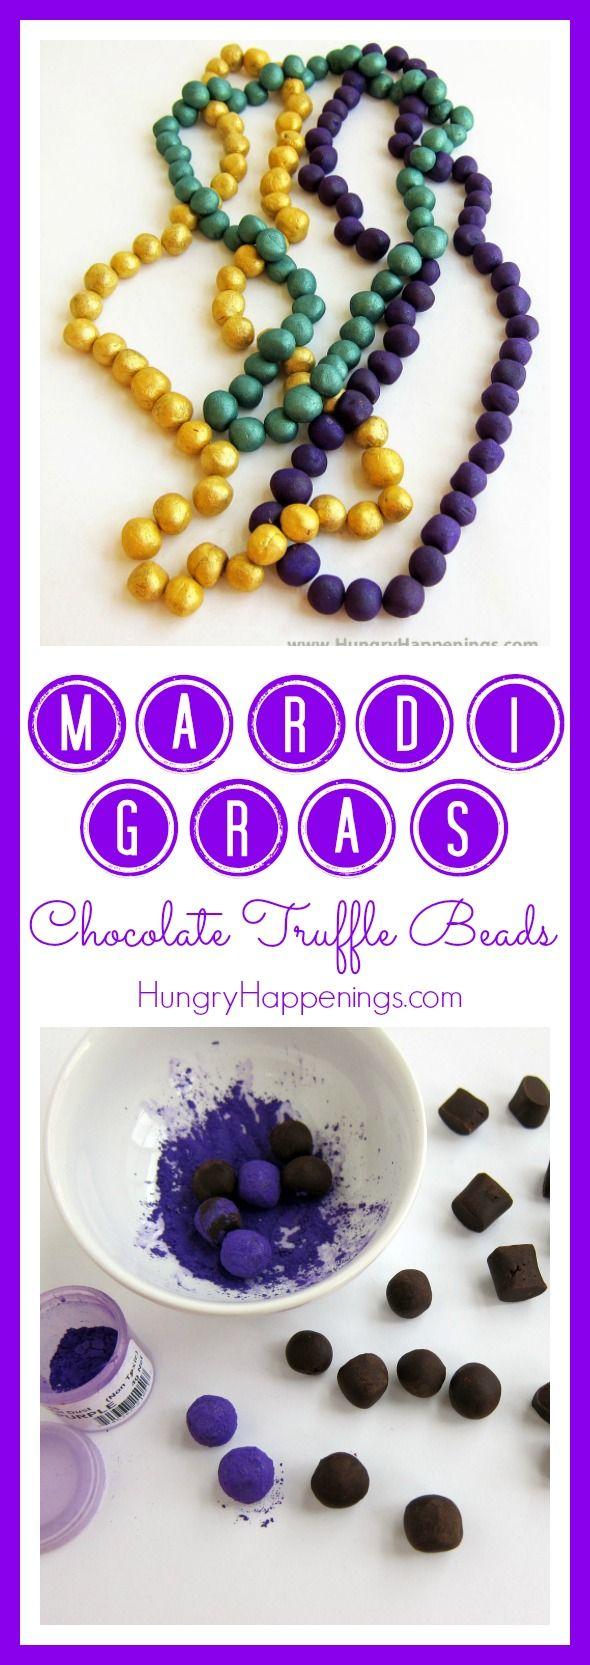 Mardi Gras Chocolate Truffle Beads - Hungry Happenings